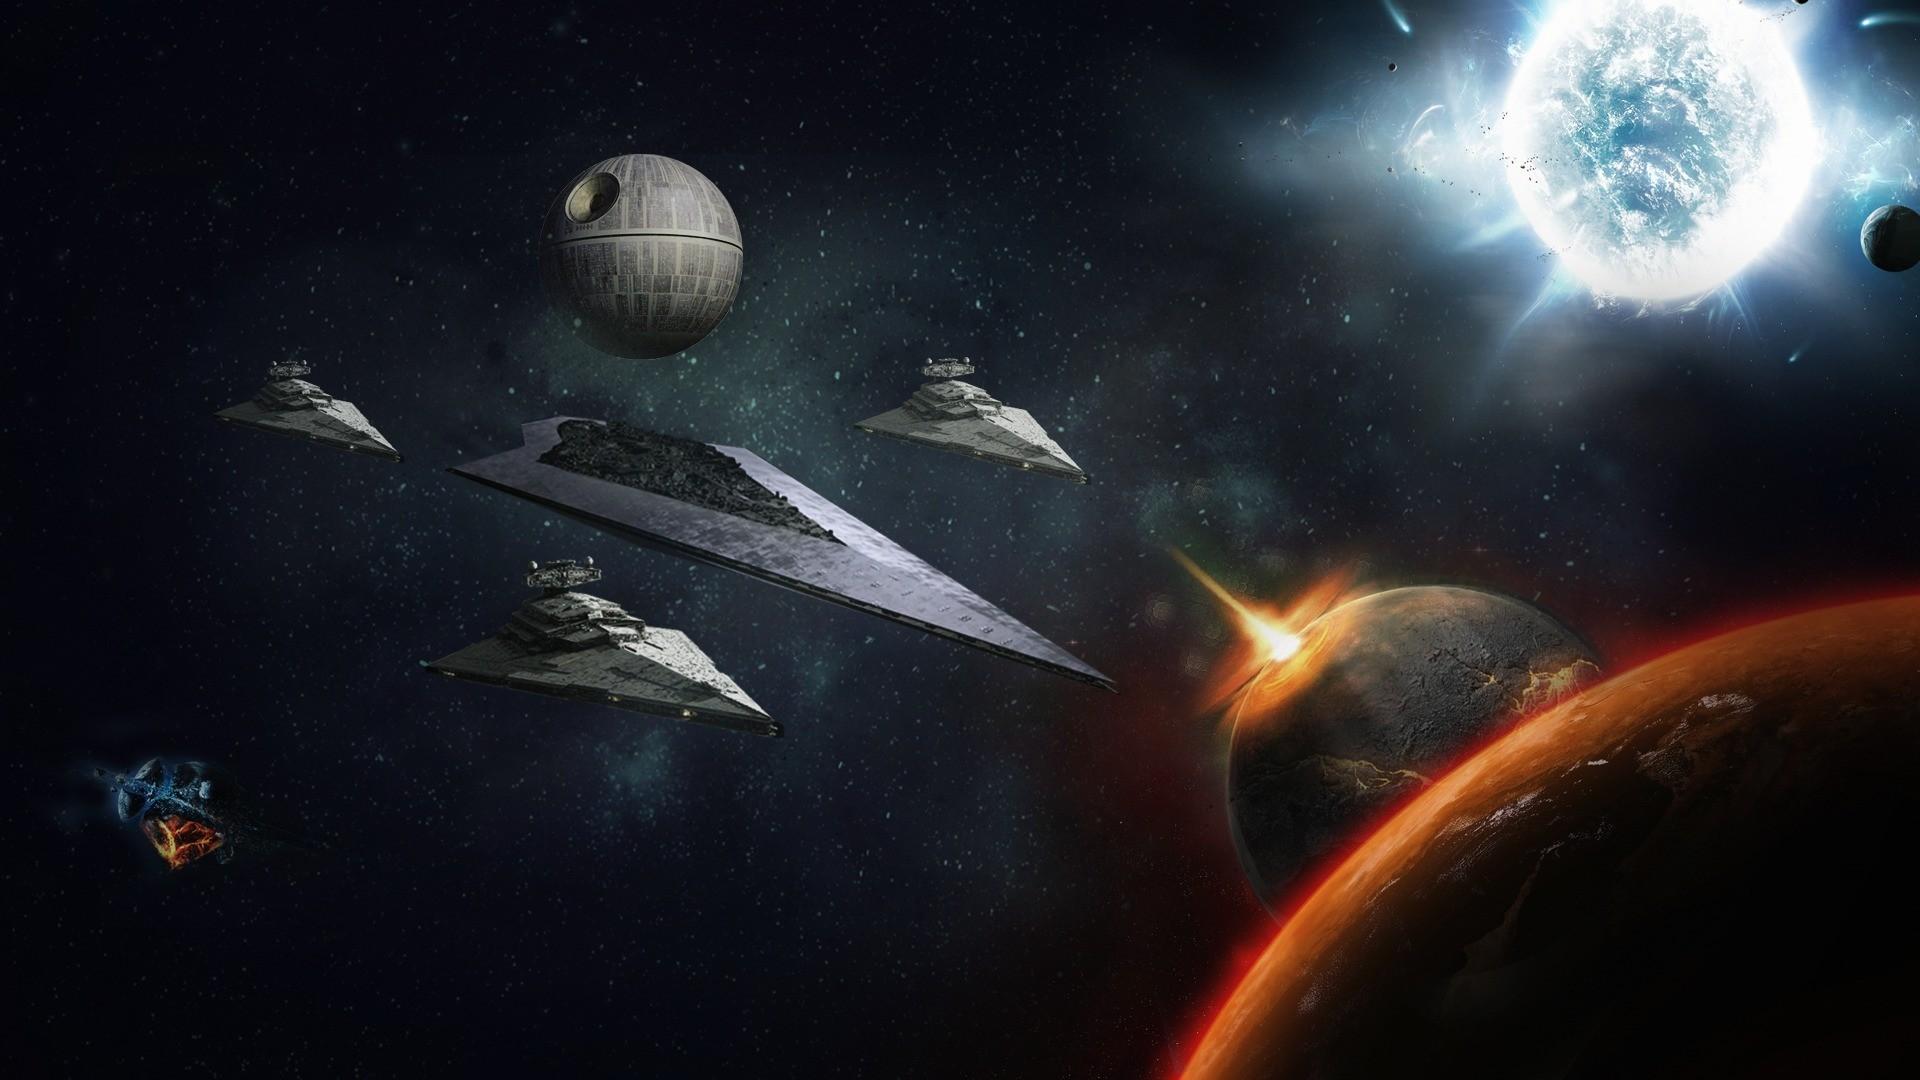 65 Star Wars Space Background Hq On Wallpapersafari